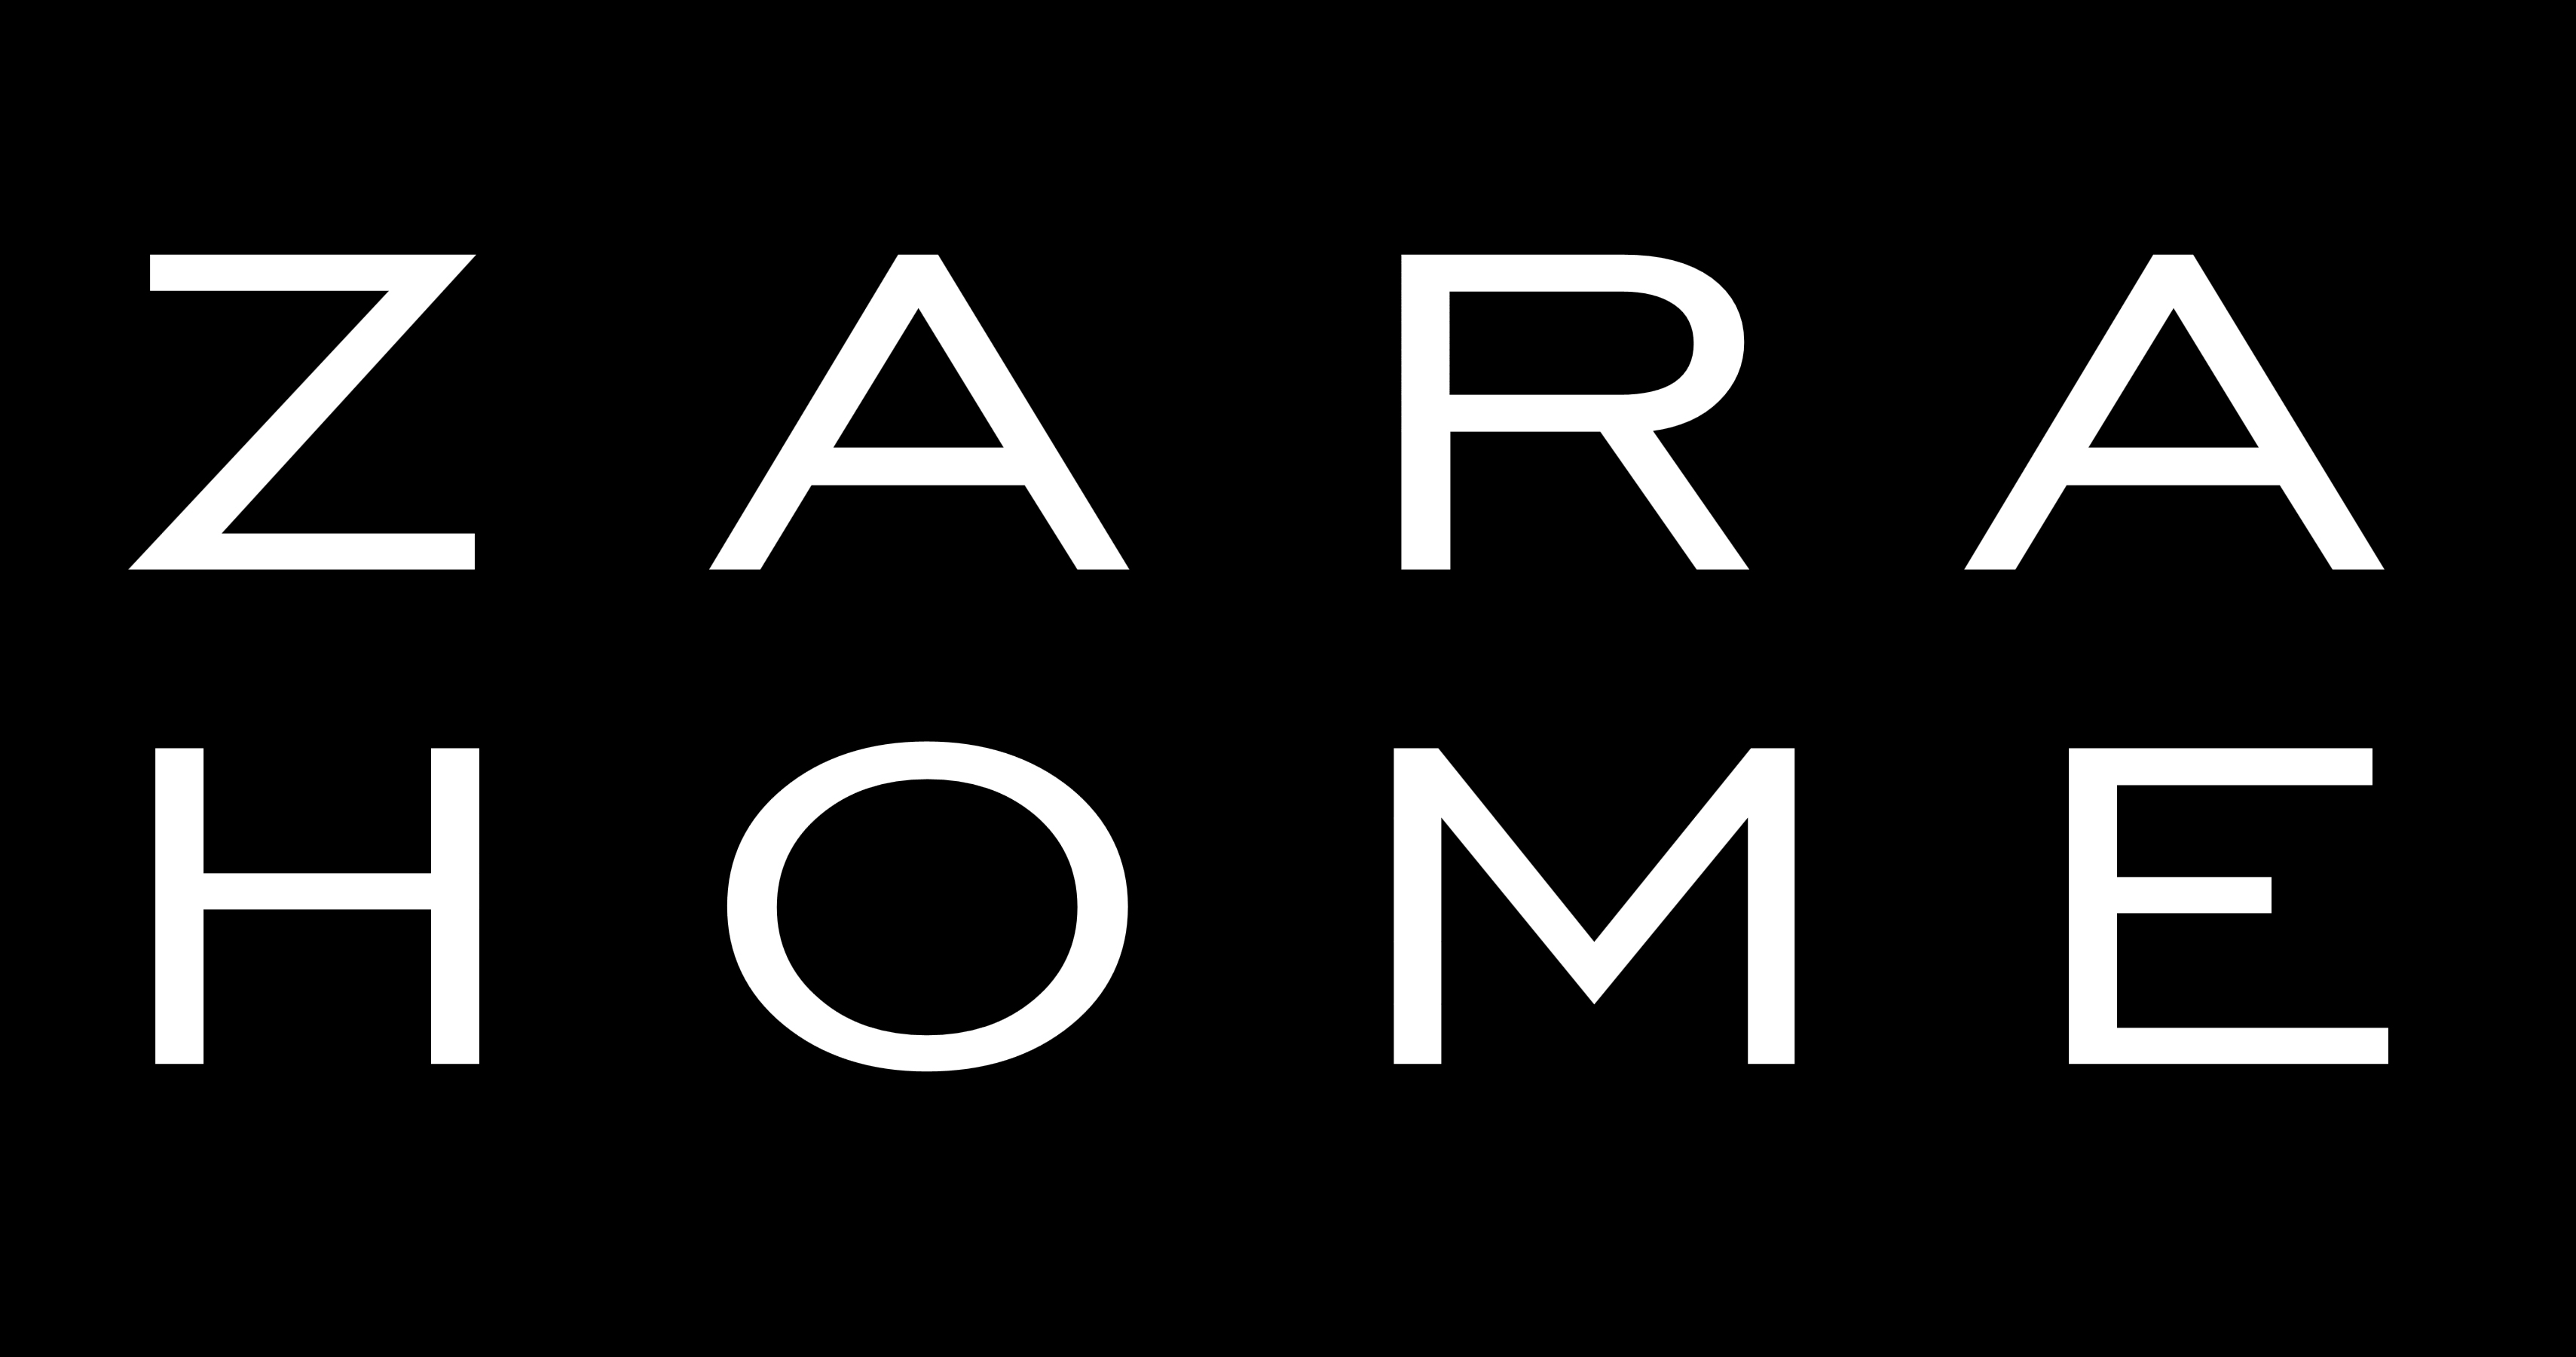 zara logo zara symbol meaning history and evolution. Black Bedroom Furniture Sets. Home Design Ideas